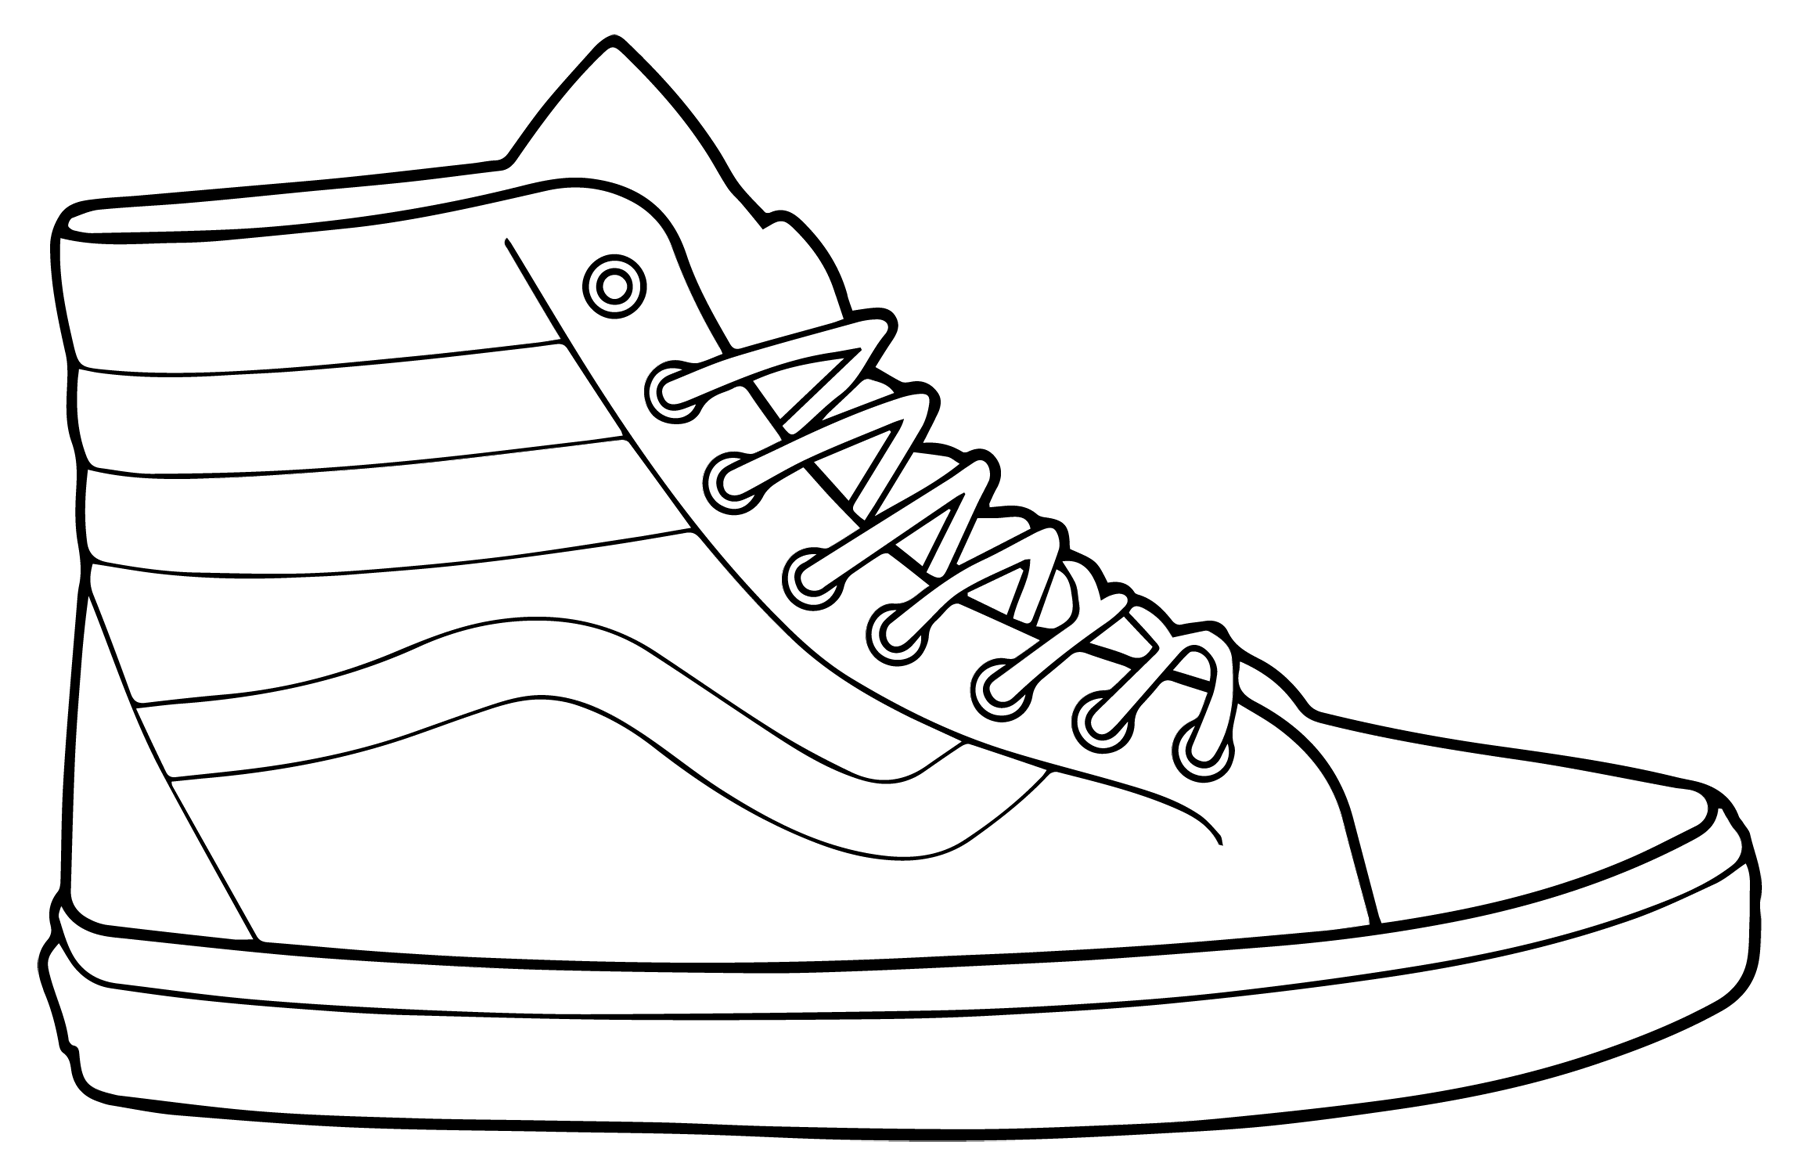 CROSSOVERS #3 - Vans Slip-On